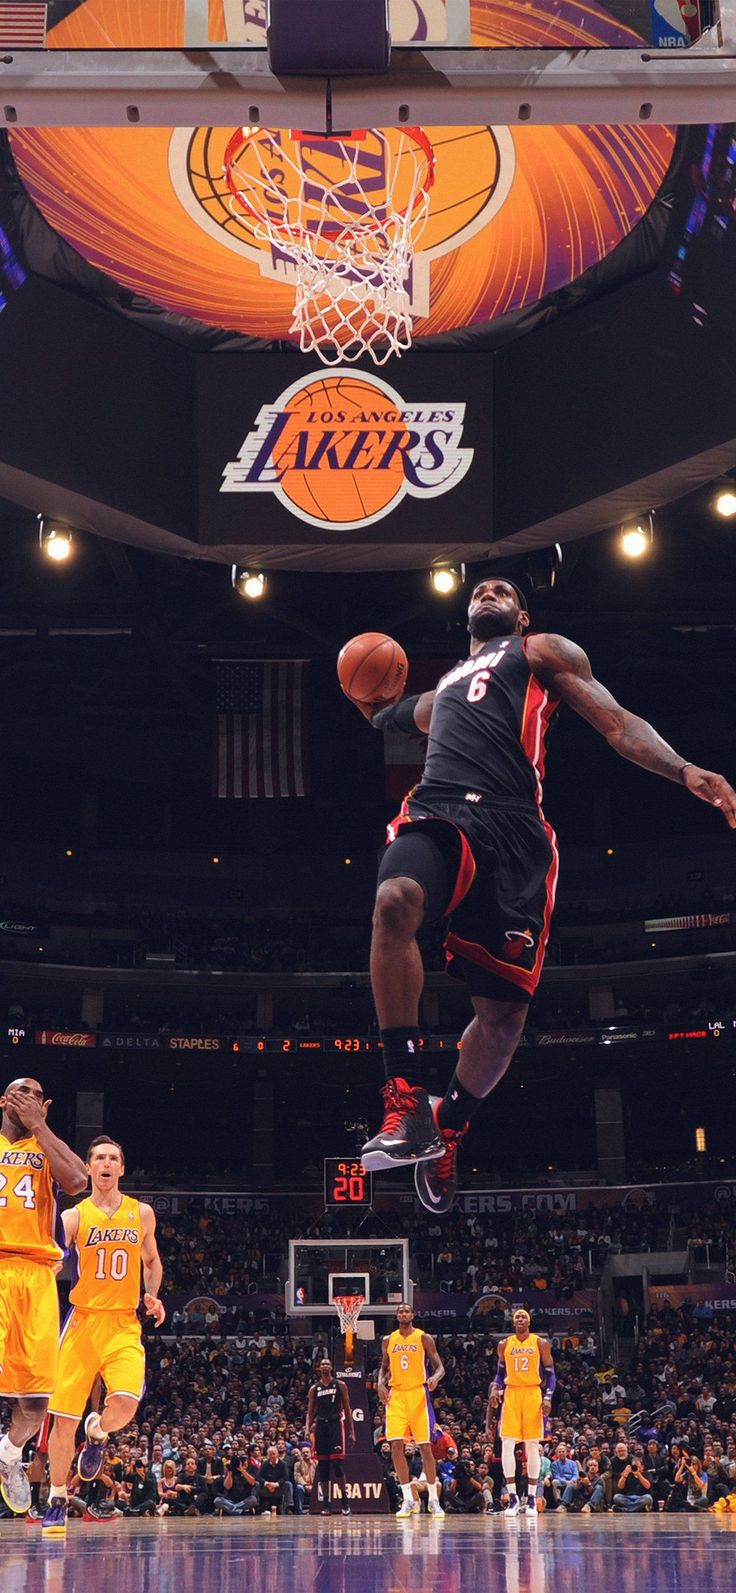 Lakers Wallpaper In 2021 Lebron James Wallpapers Nba Basketball Dunks Nba Lebron James